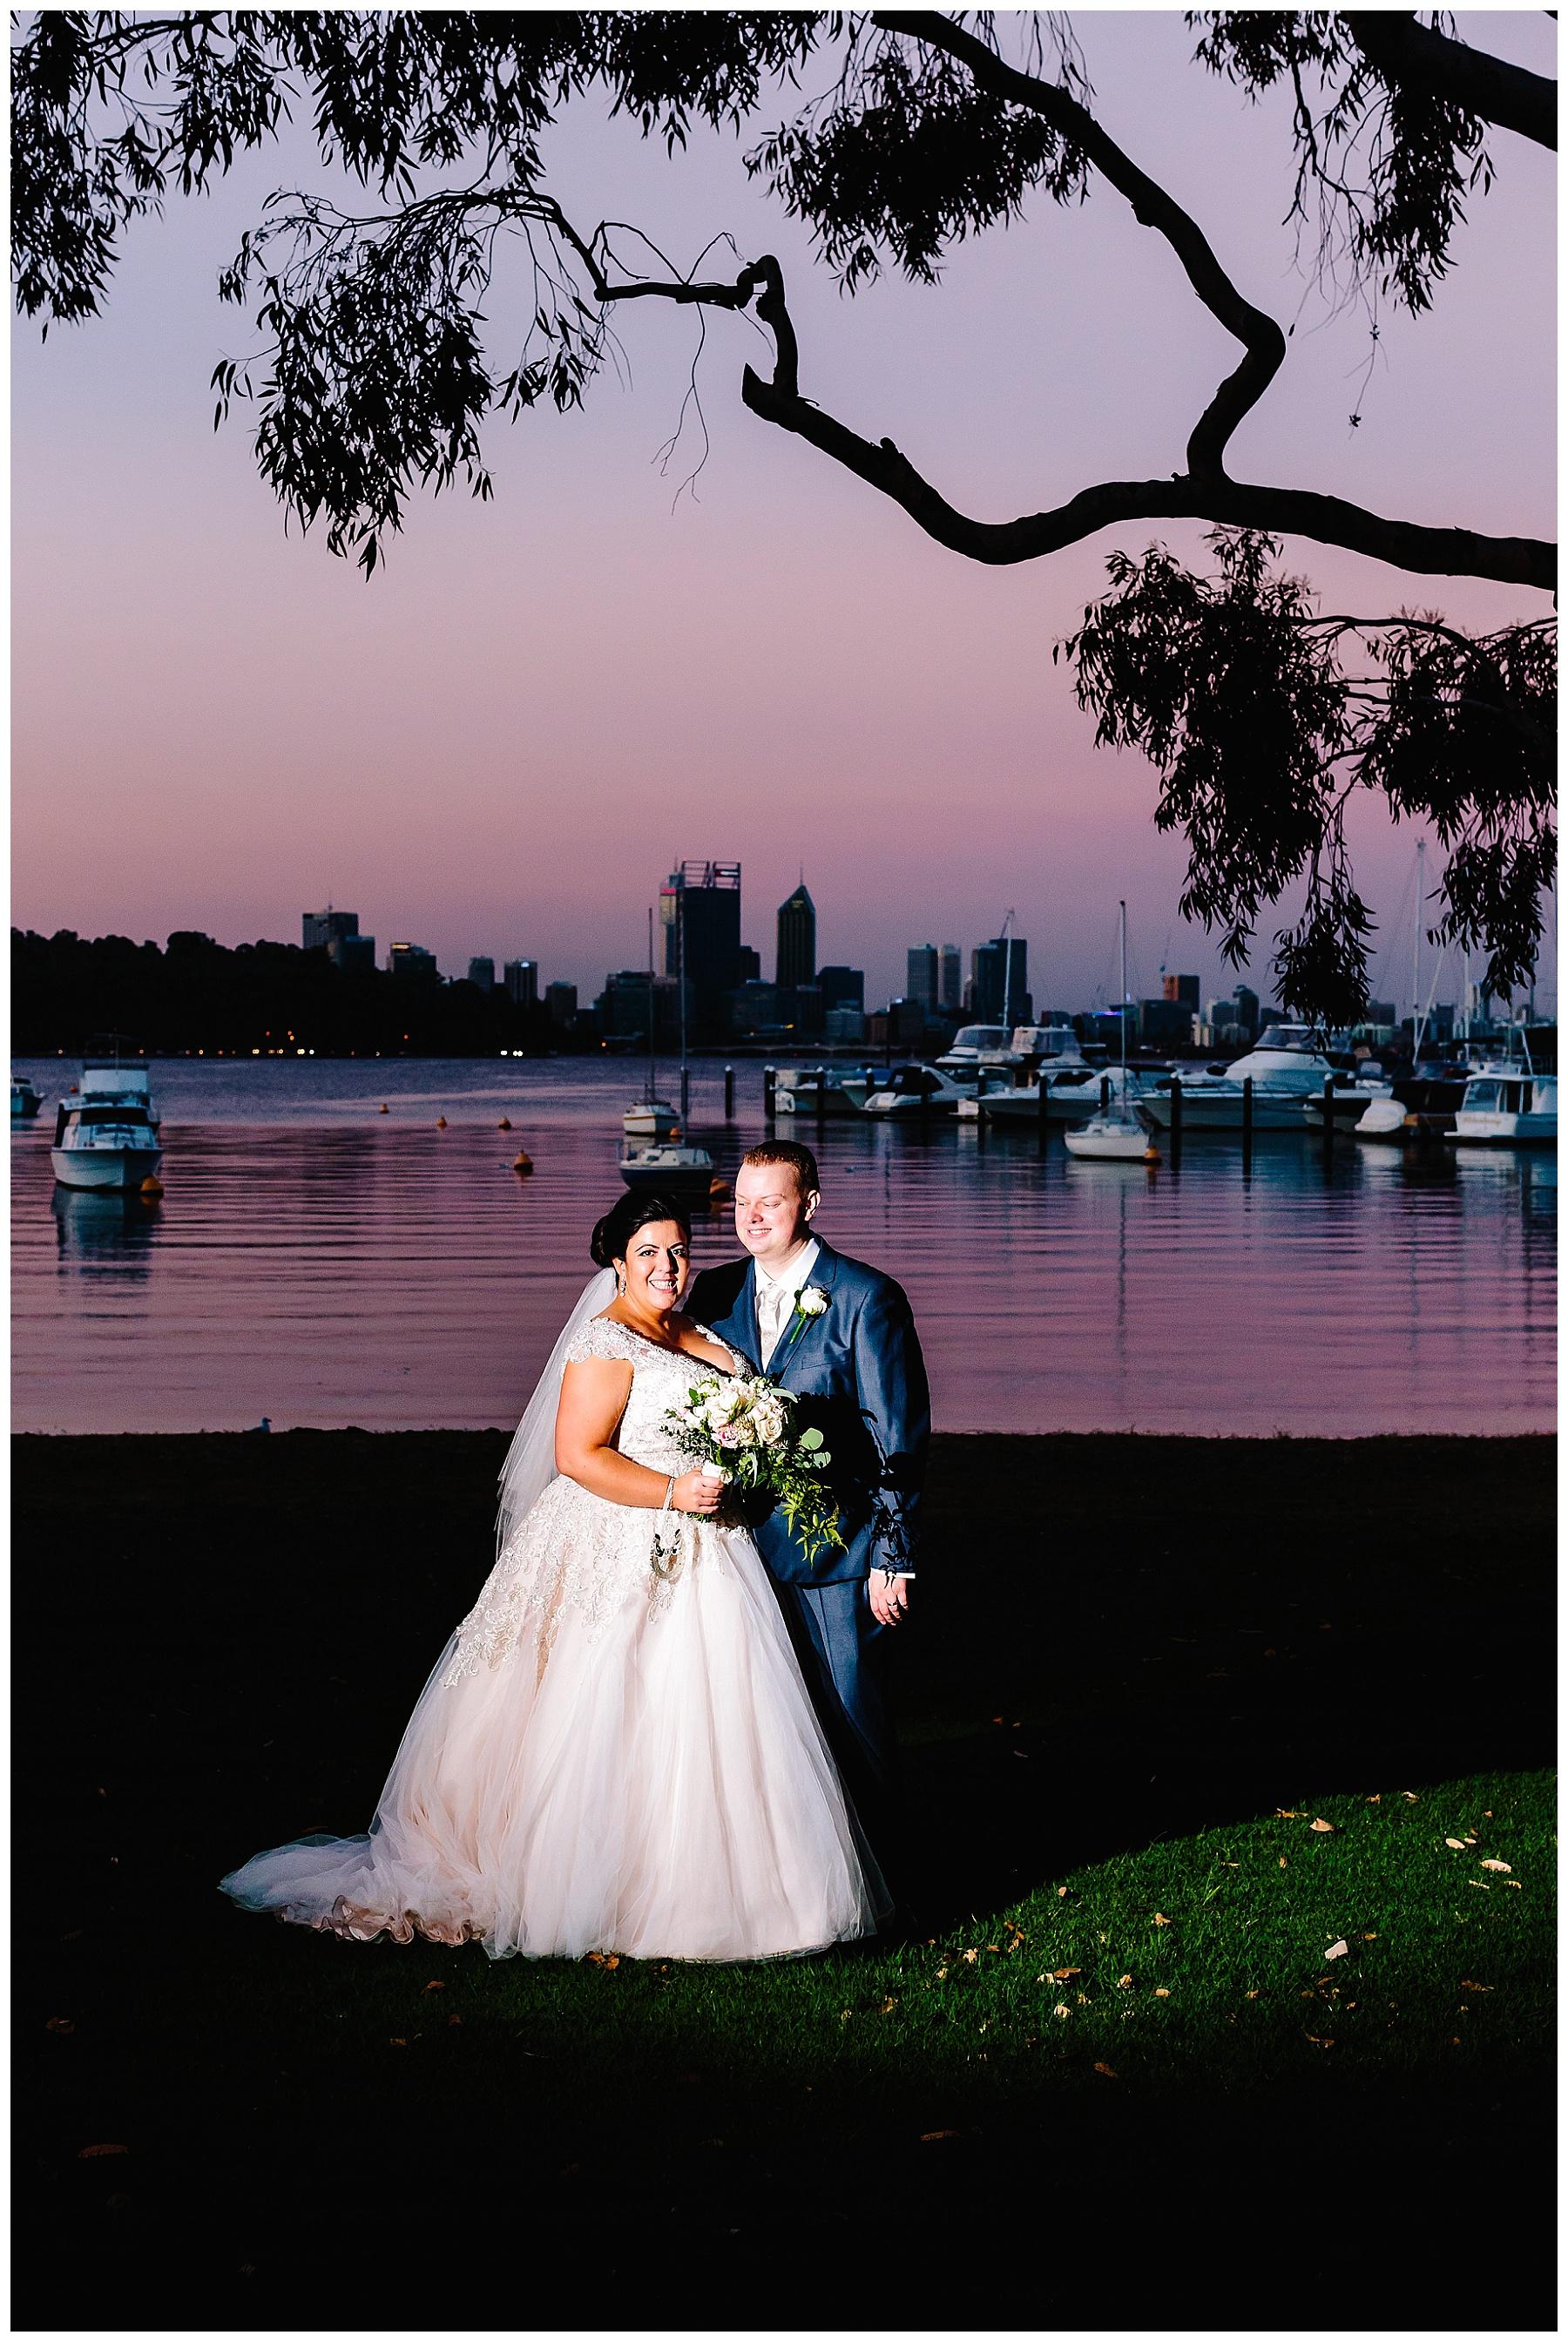 Sunset wedding at Matilda Bay